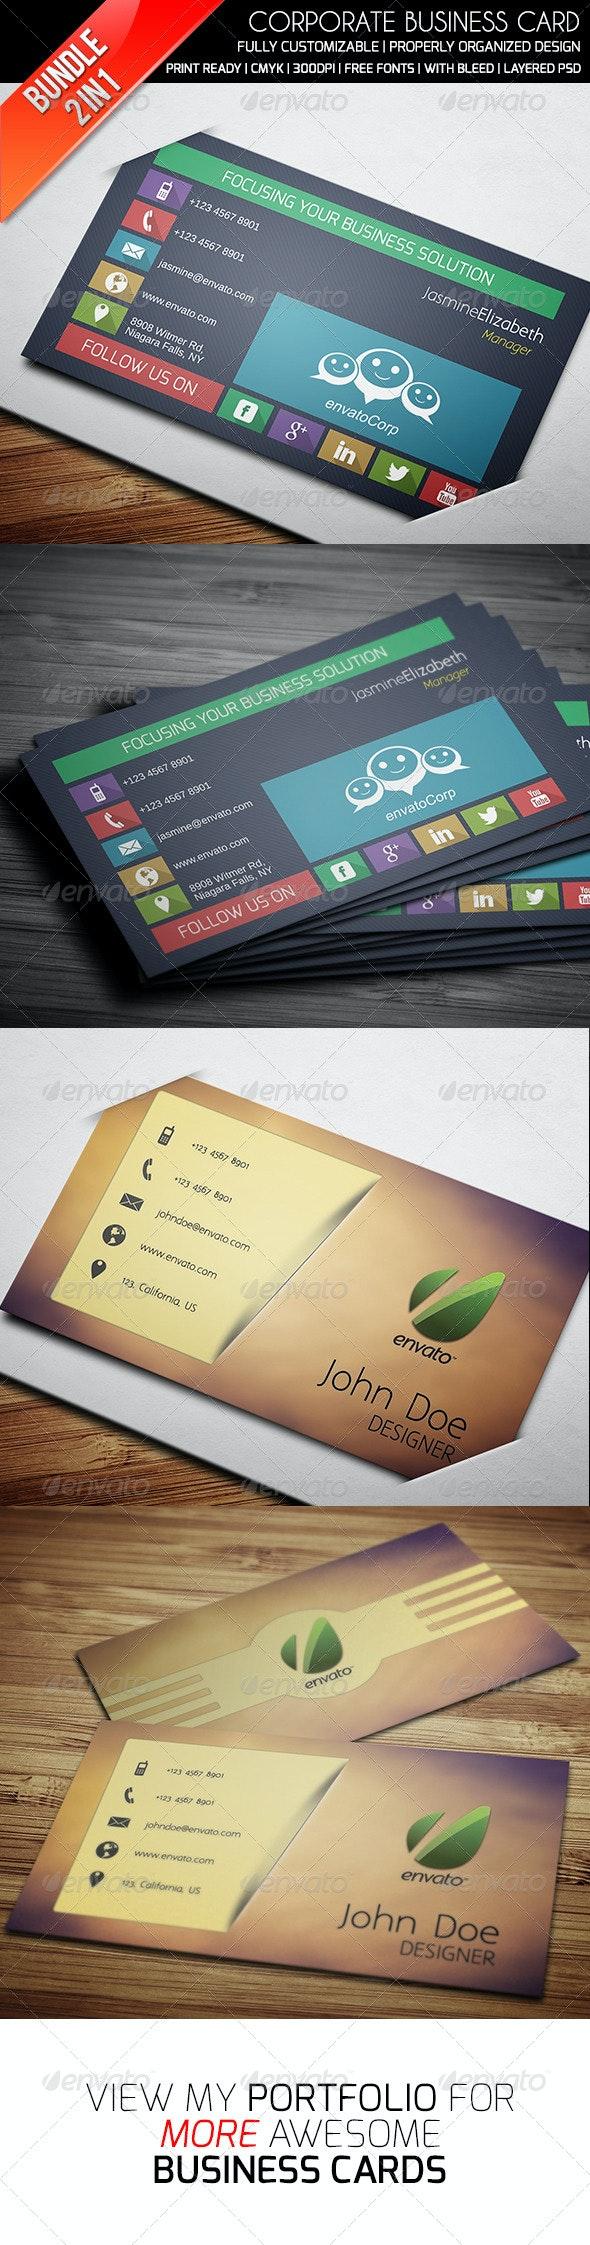 Ethanfx Business Card Bundle Vol 5 - Business Cards Print Templates